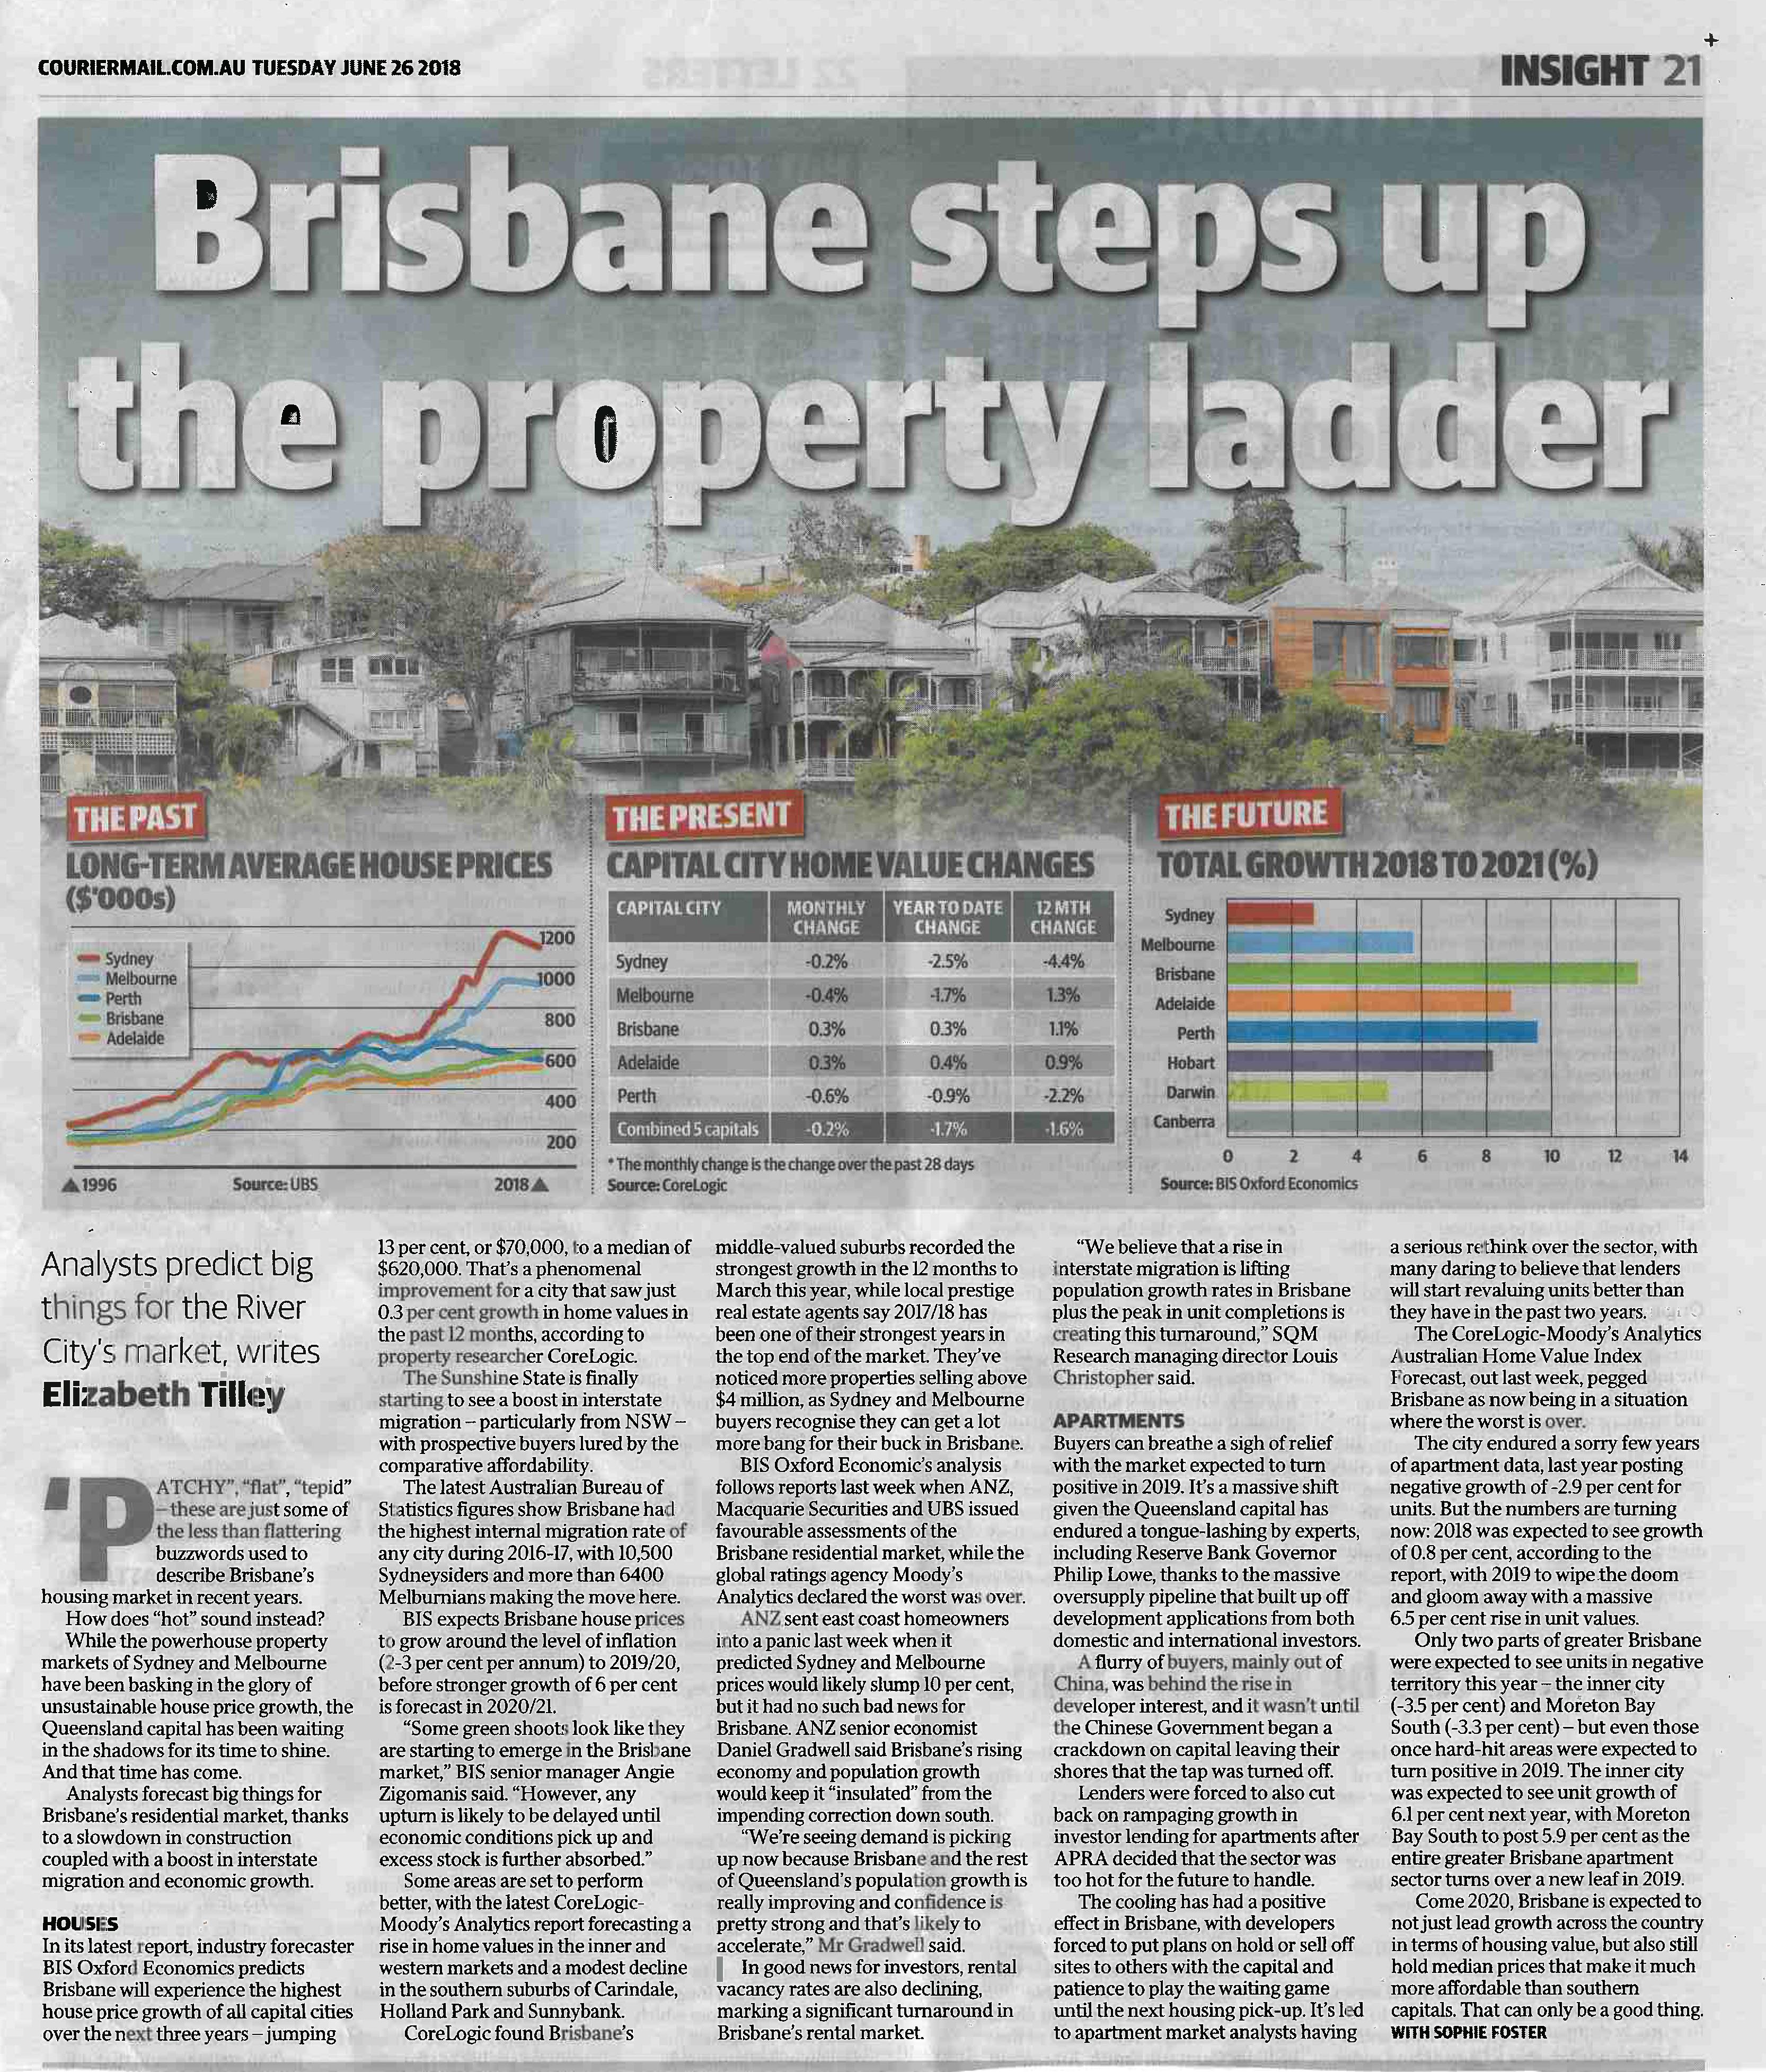 https://assets.boxdice.com.au/laguna/attachments/d7c/0f3/cm_260618_brisbane_steps_up_the_property_ladder.jpg?146fc7c6c7af5a5b3e193ecd922953e2